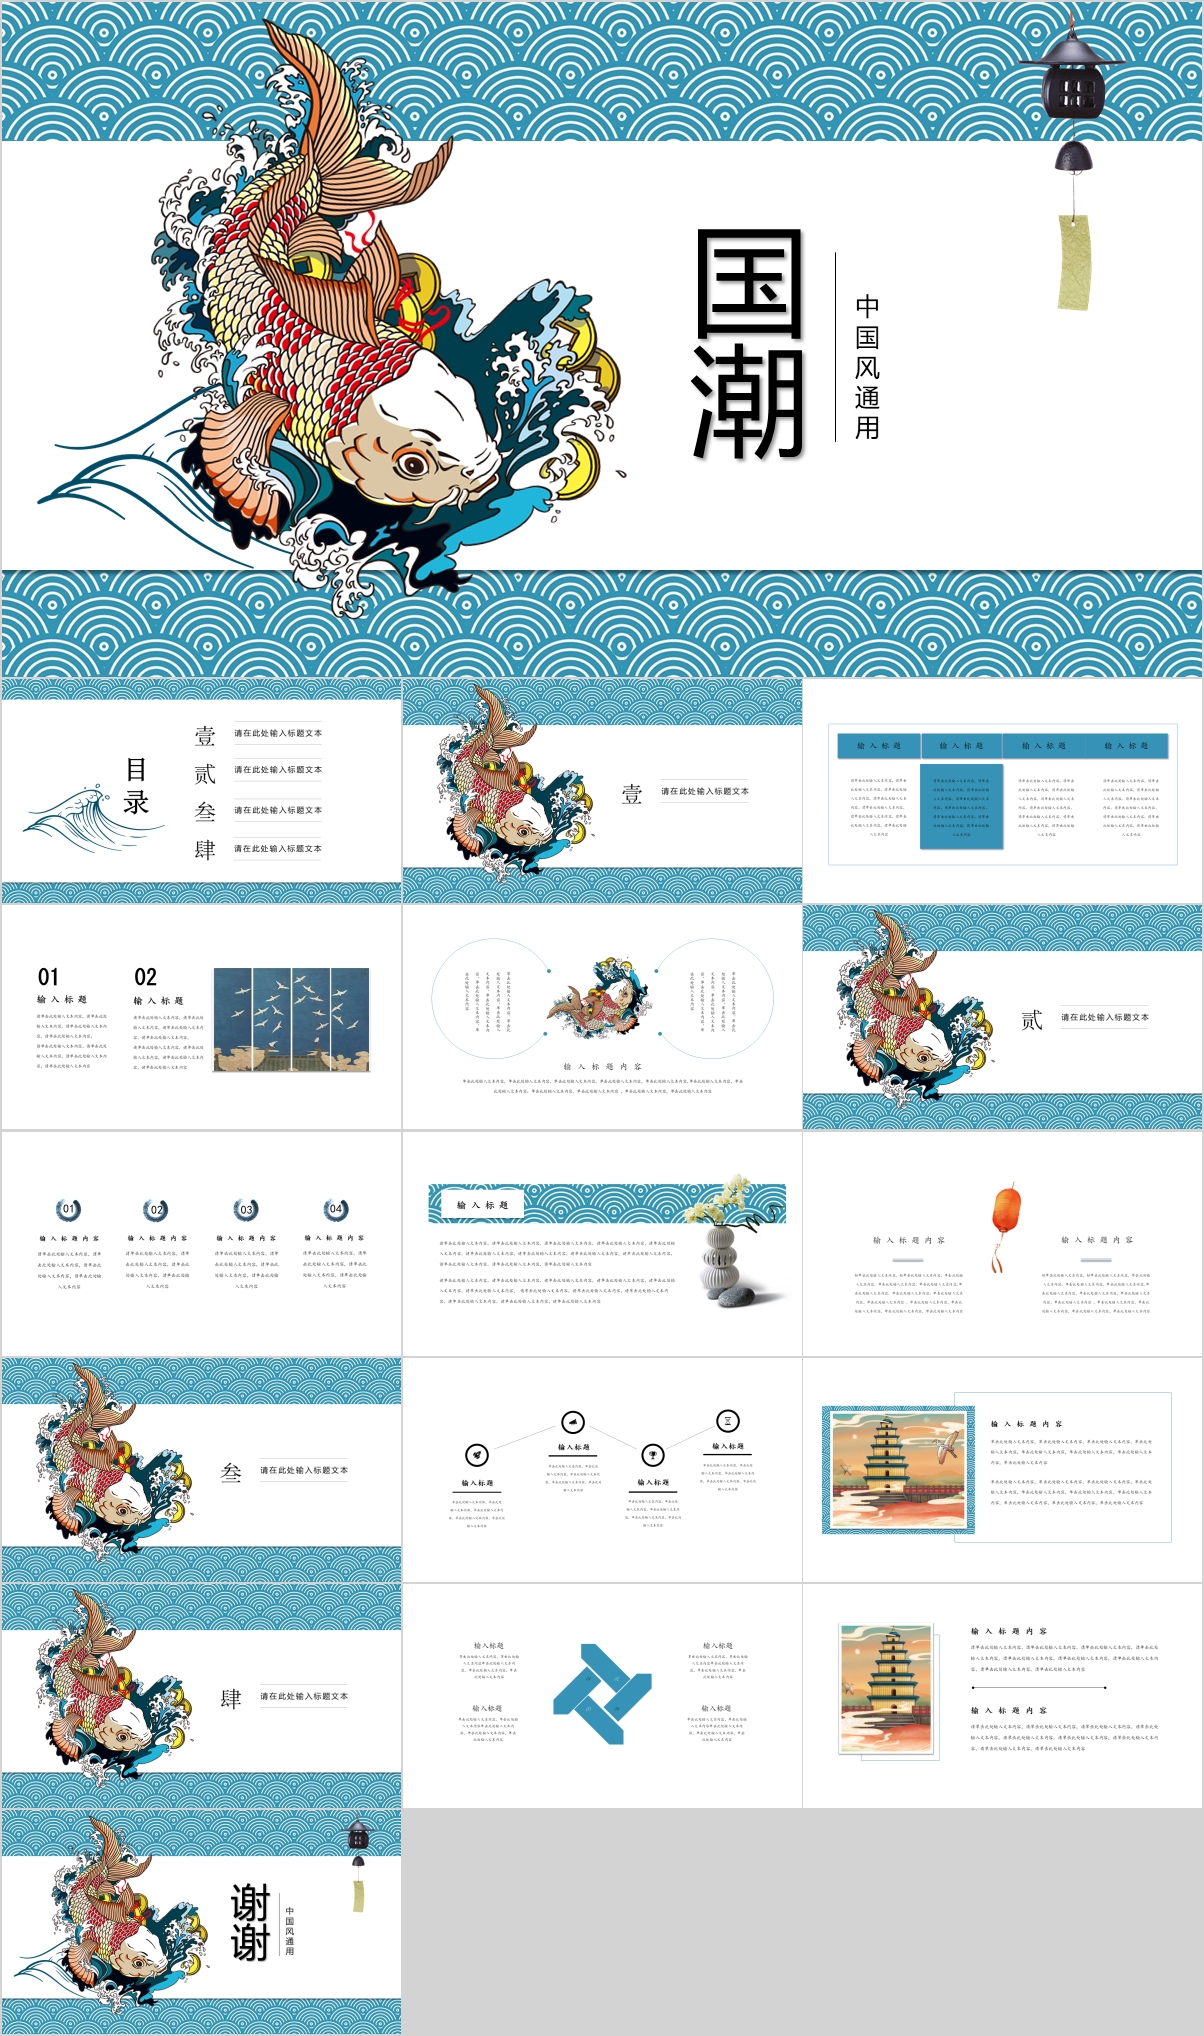 【PPT】国潮复古文艺中国风工作计划活动策划PPT模板-爱资源分享